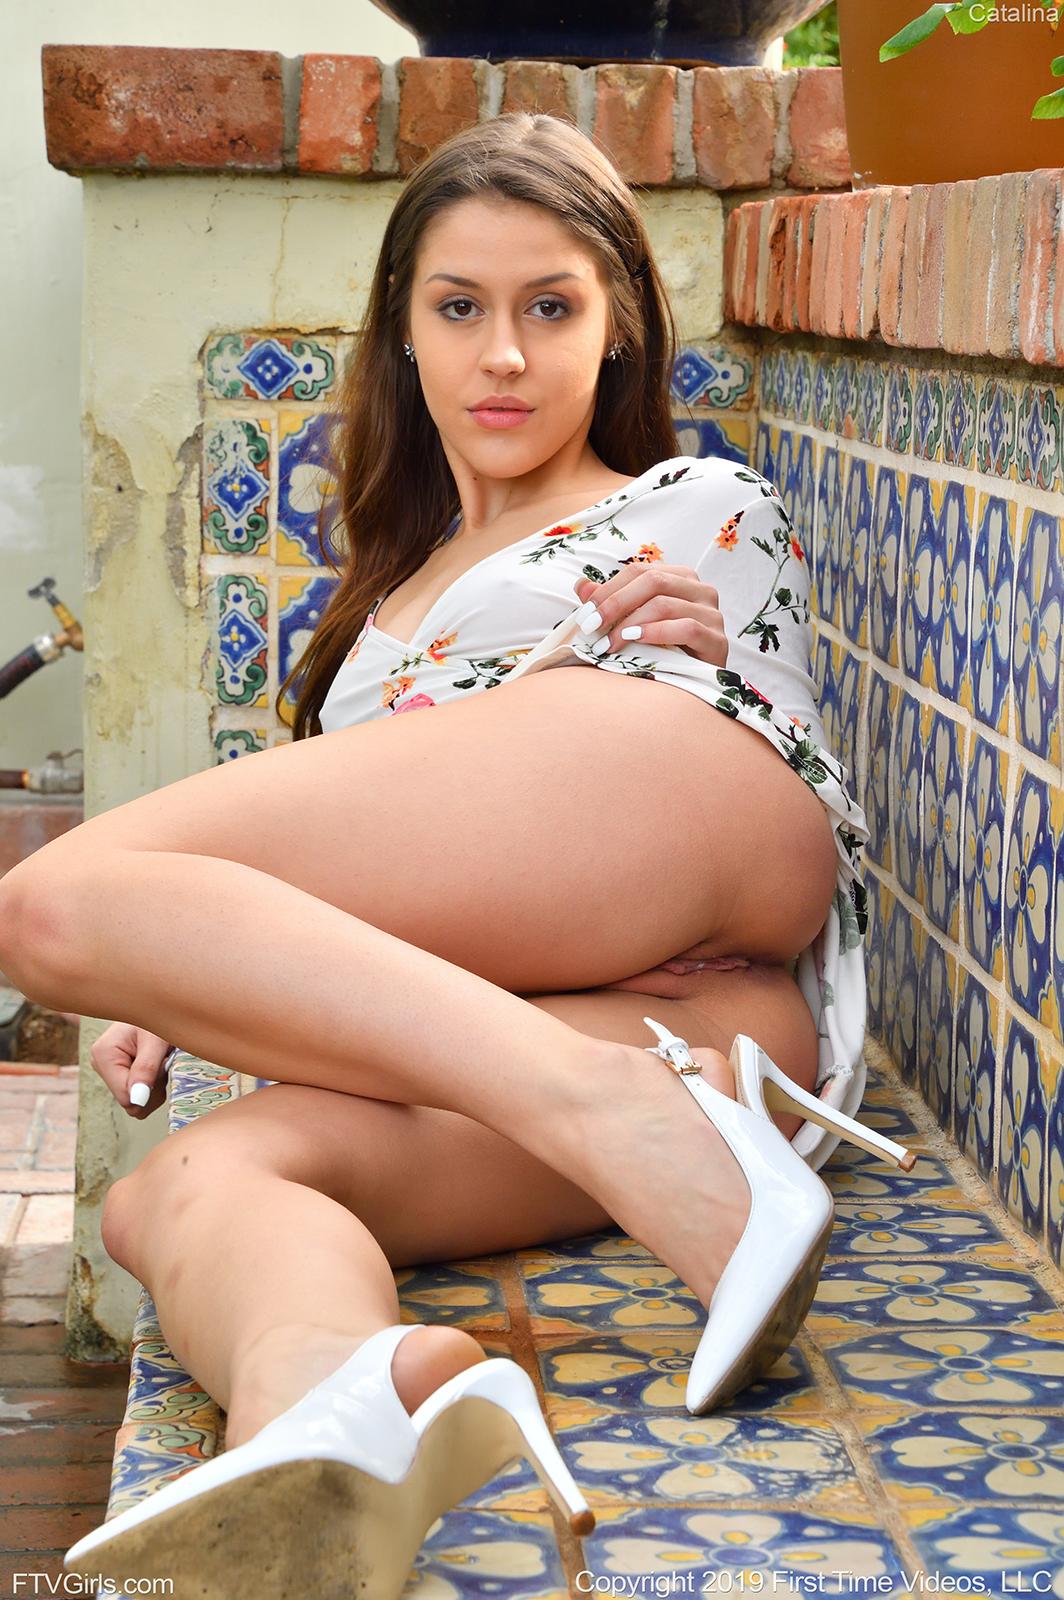 Nude catalina Catalina Aruca